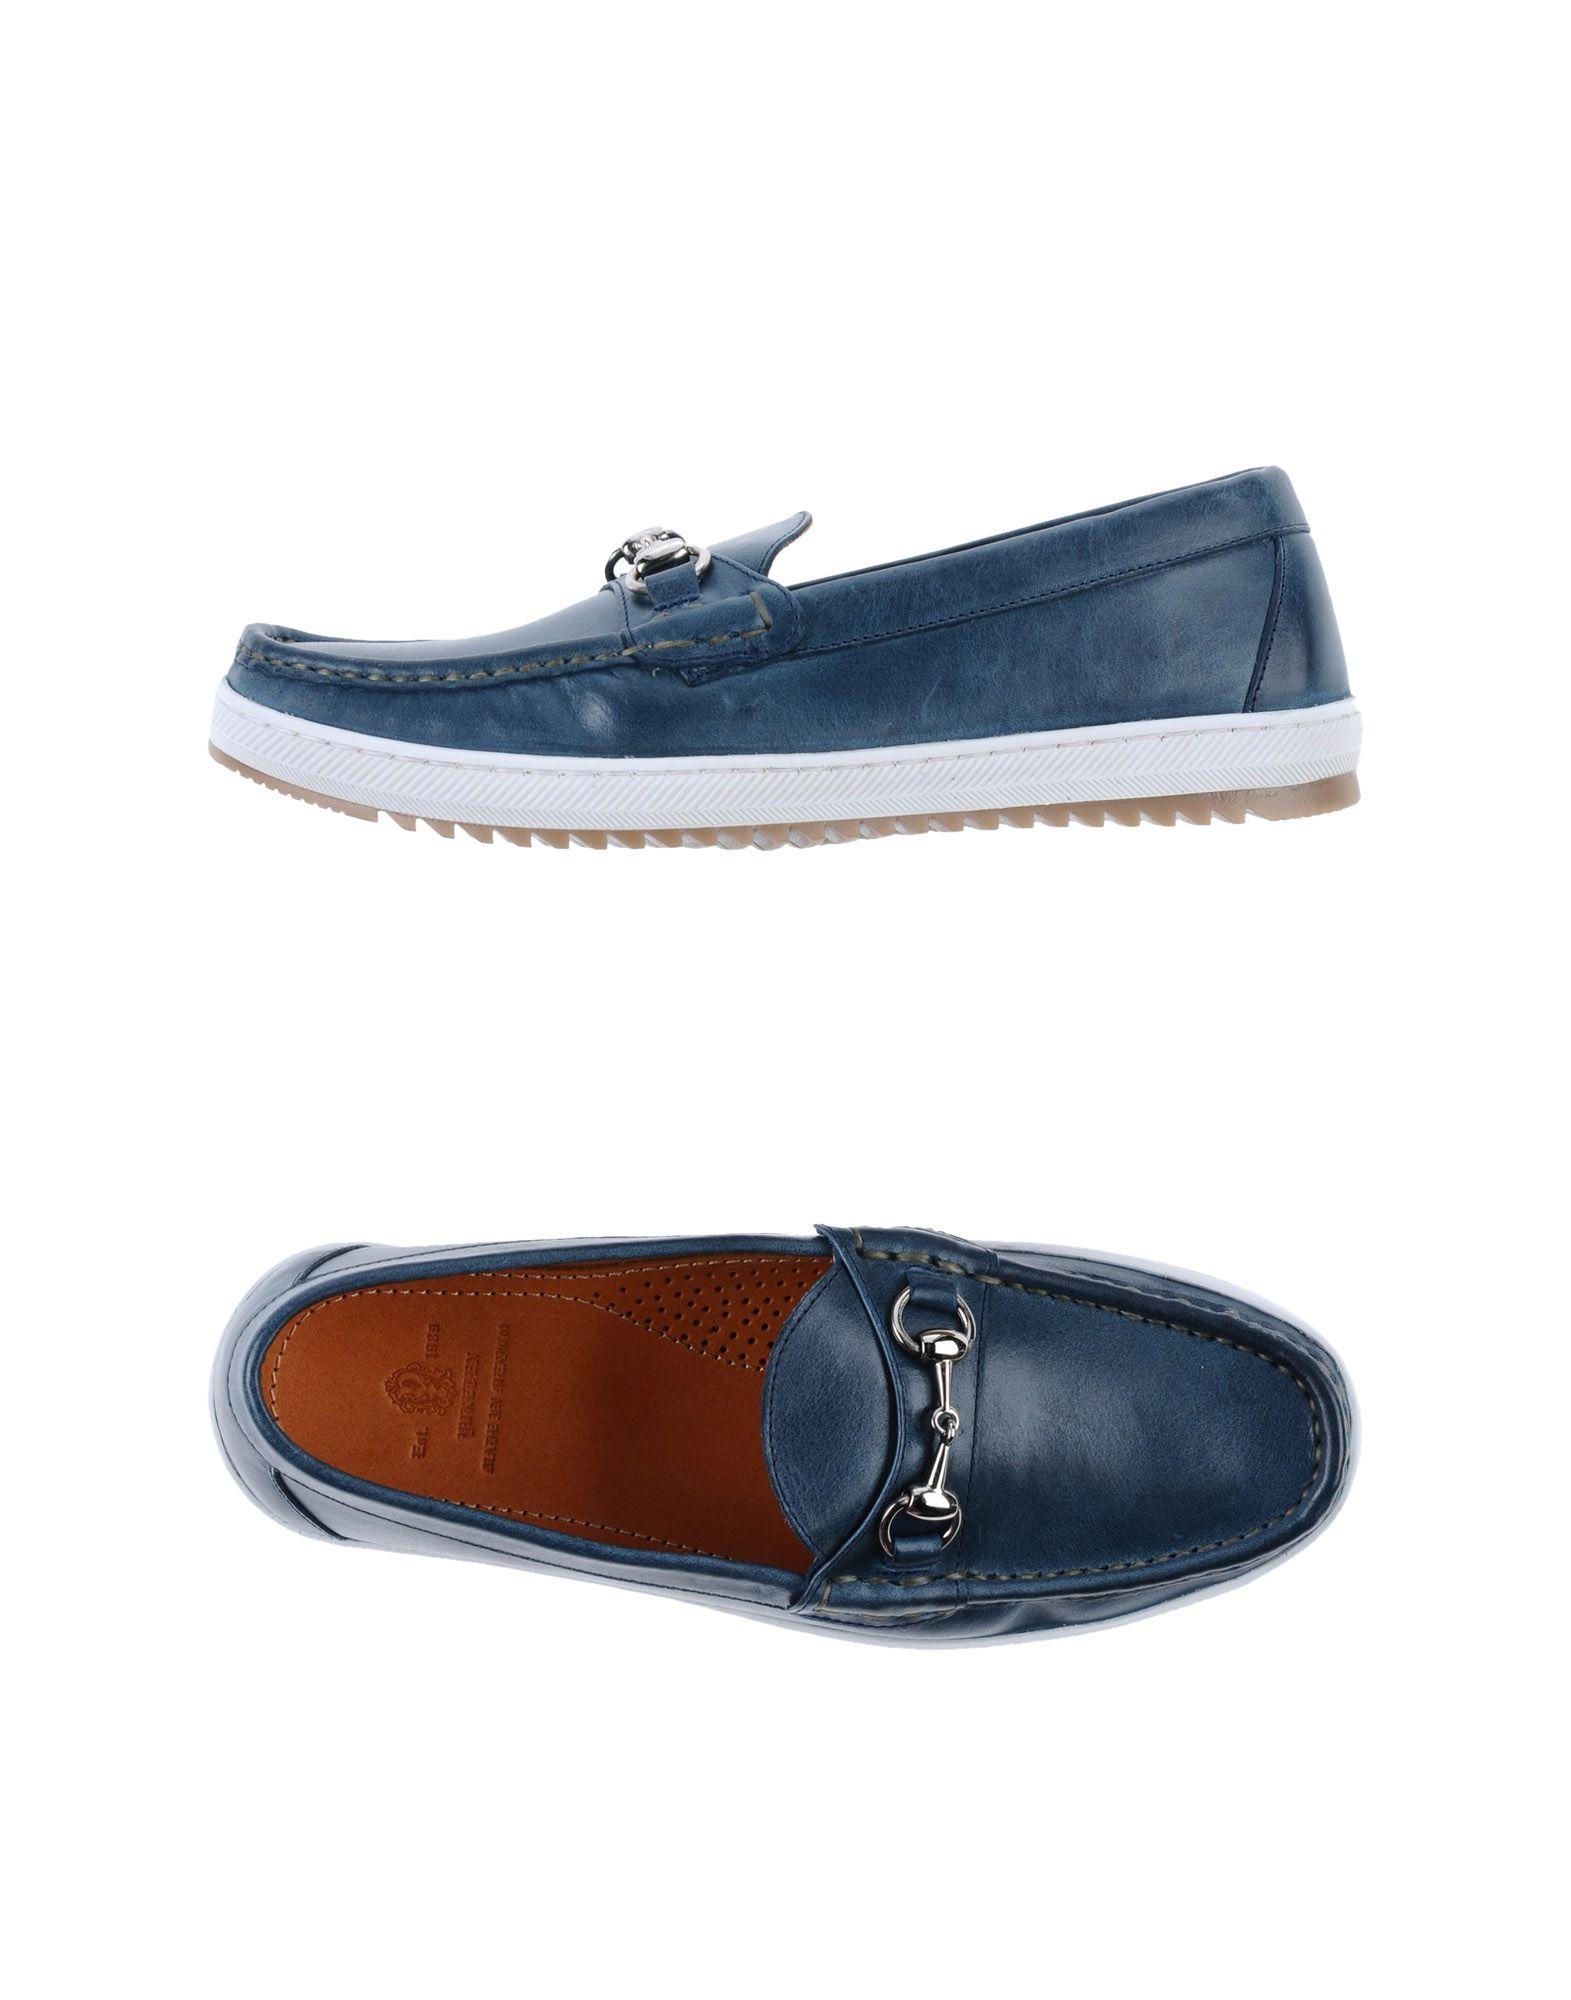 0f900f379a Lyst - Yuketen Moccasins in Blue for Men